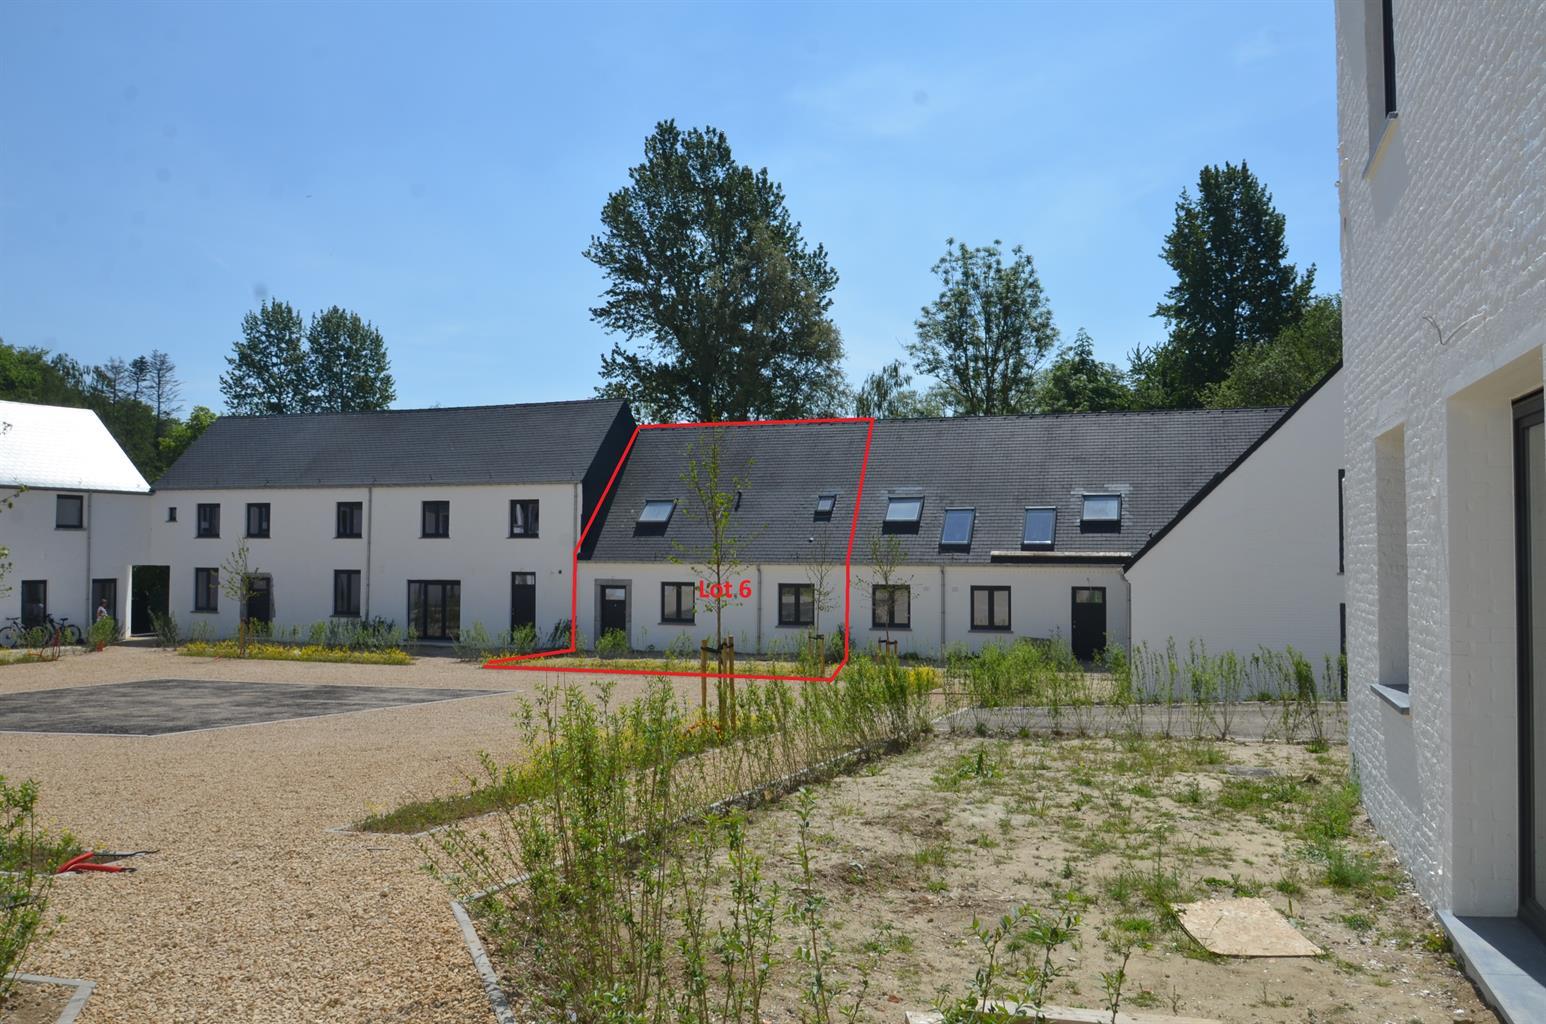 Maison - Genappe Bousval - #4074820-0